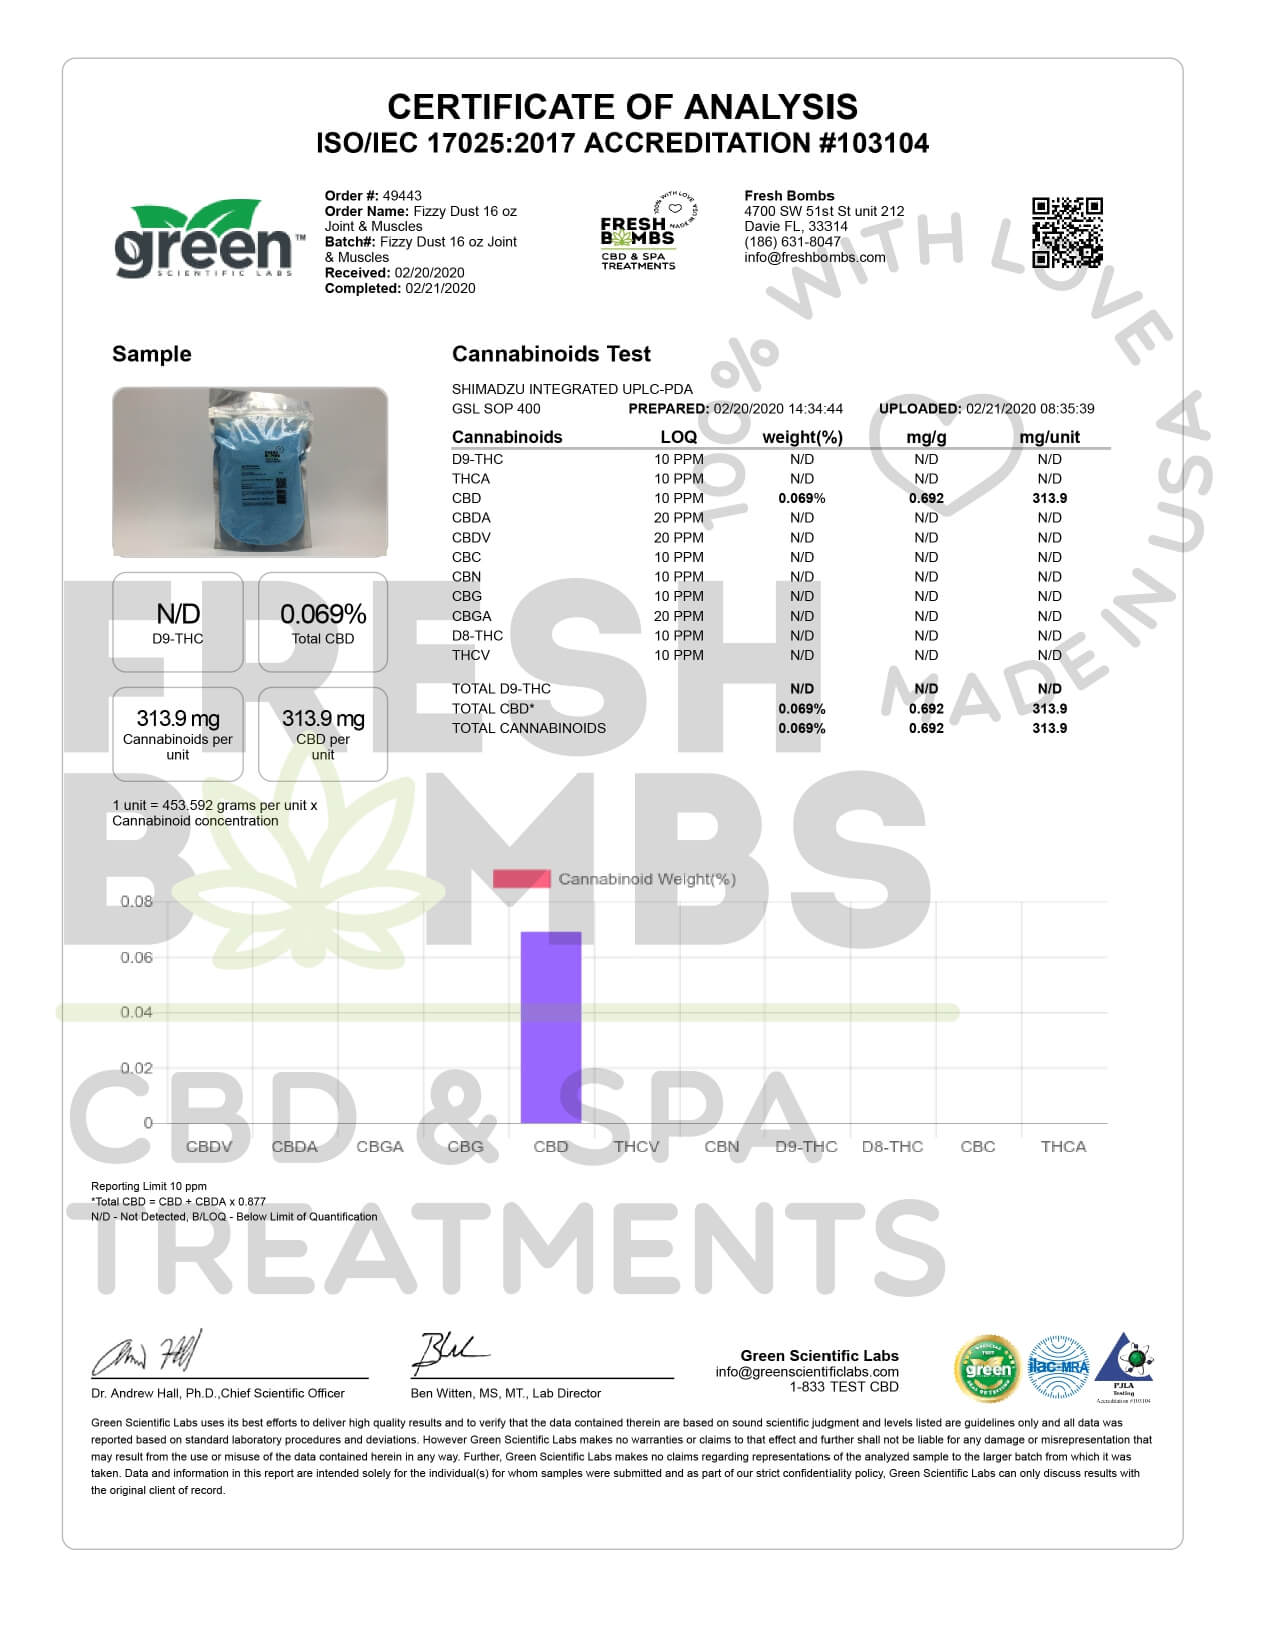 Fresh Bombs CBD Bath Muscles & Joint Fizzy Dust 16oz 250mg Lab Report